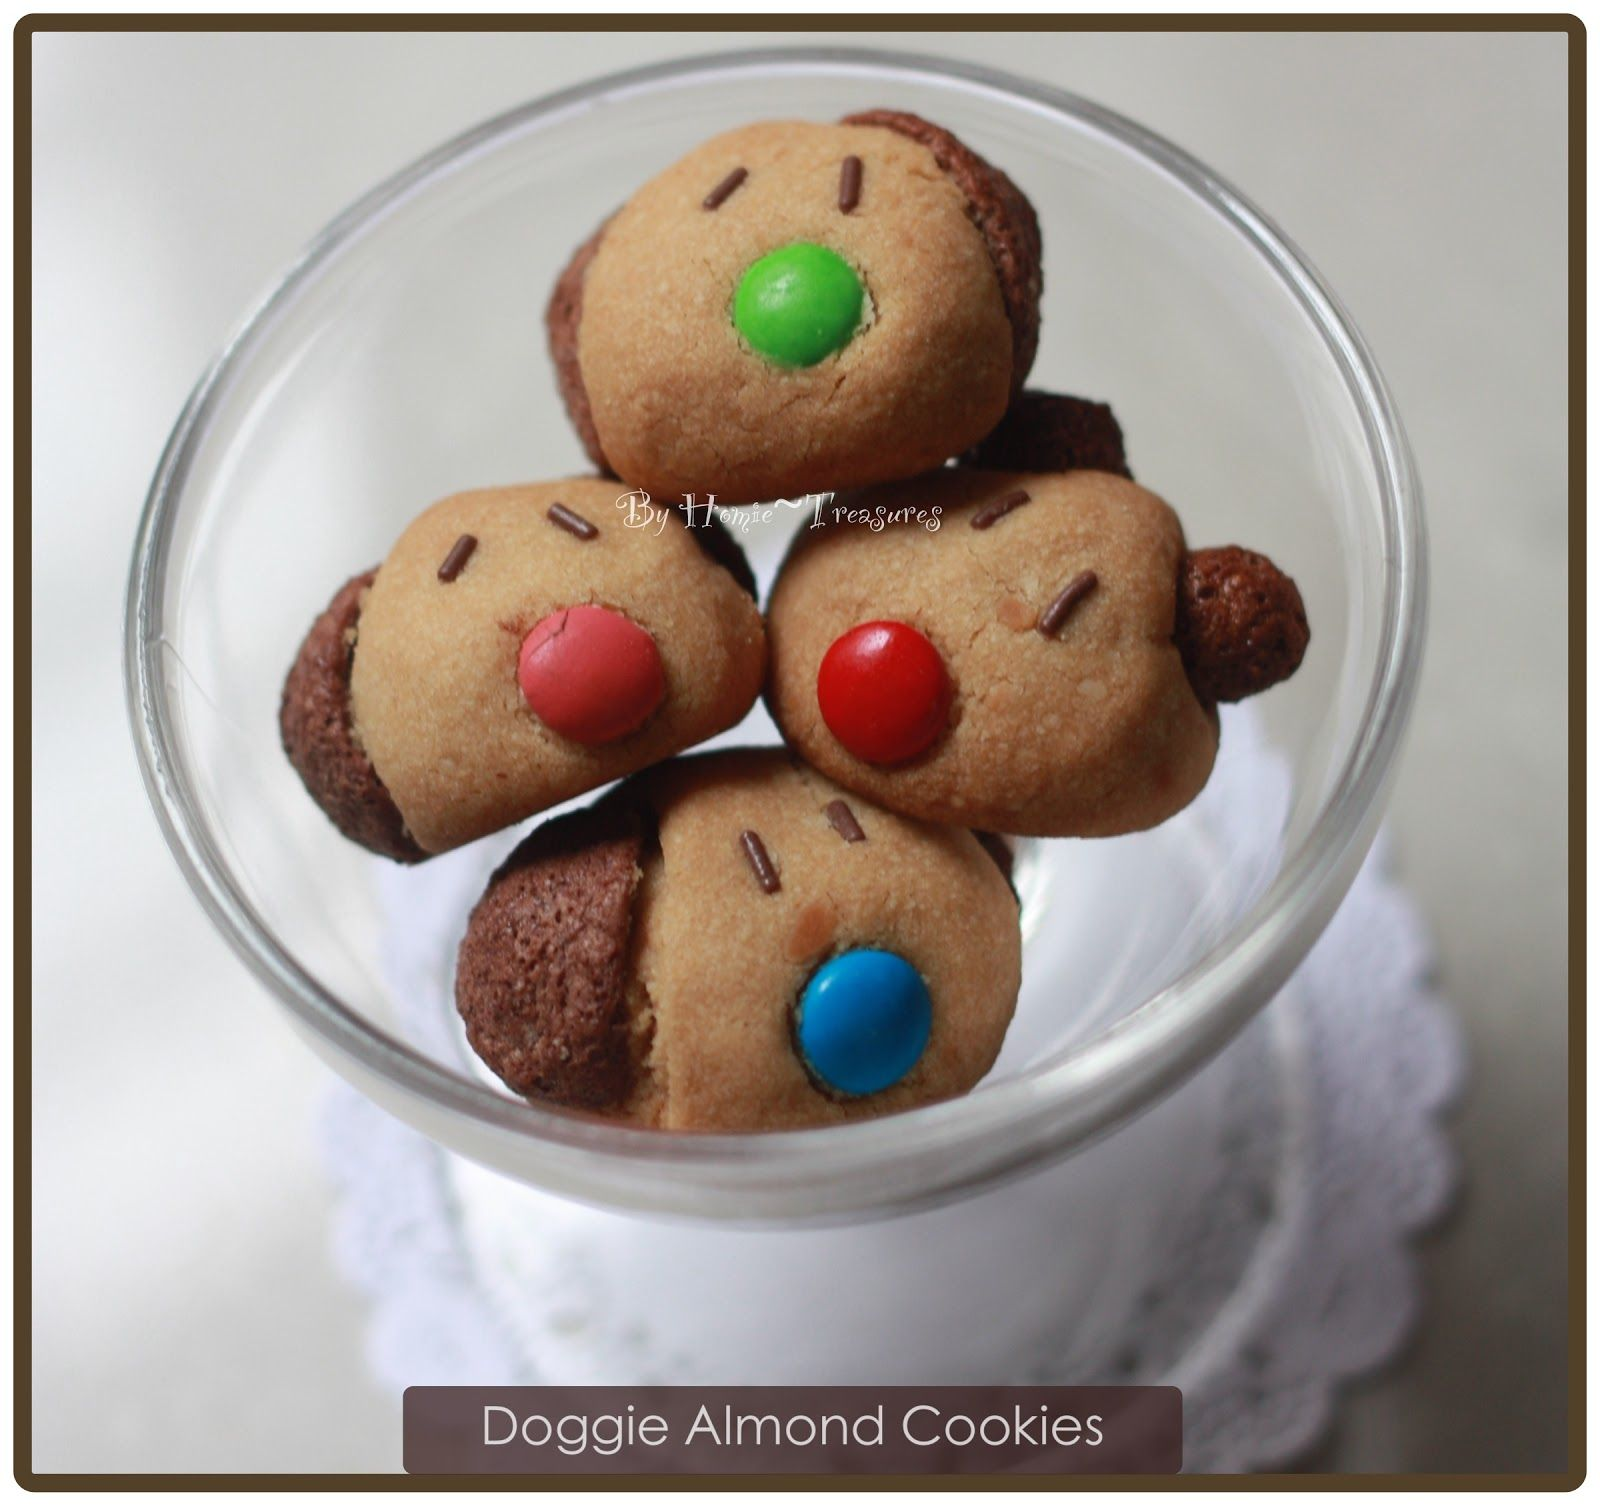 Woo Woo Doggie Almond Cookies Almond Cookies Chinese New Year